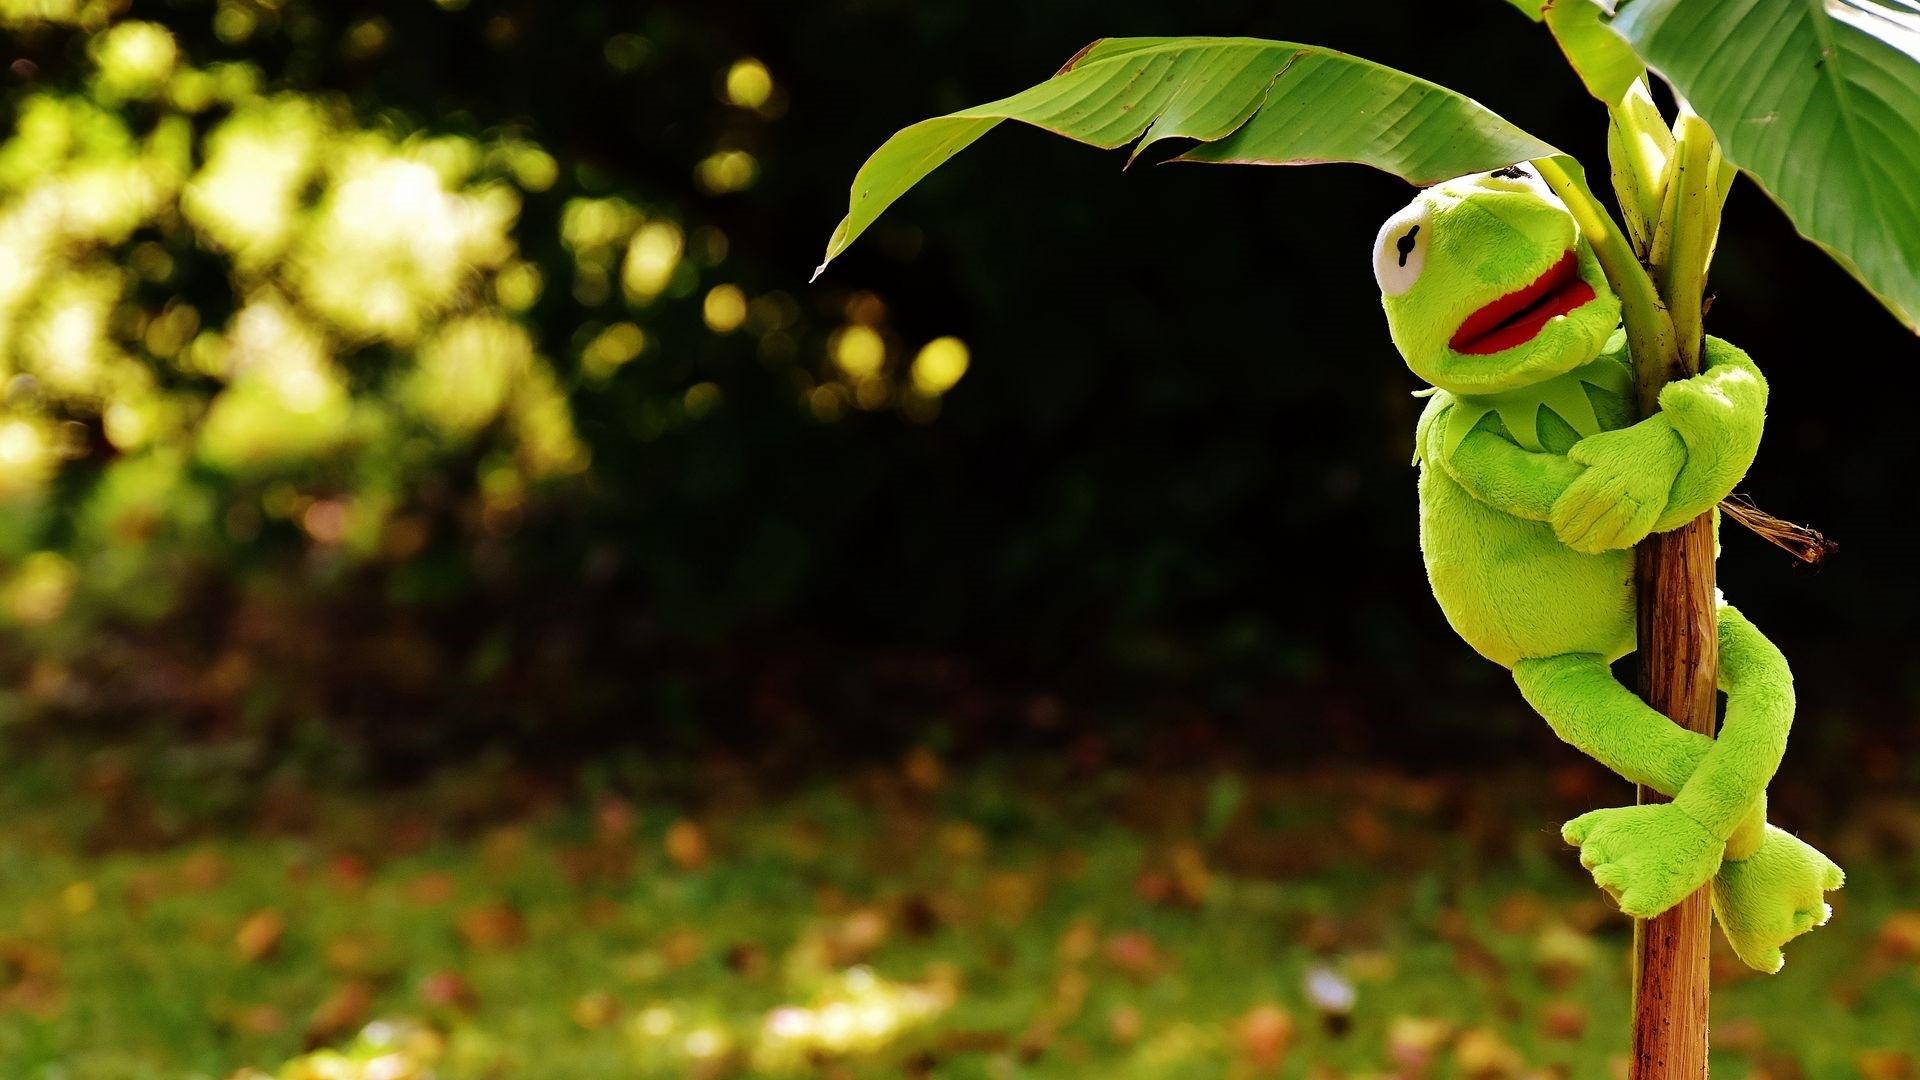 Hearts Kermit The Frog hd wallpaper download